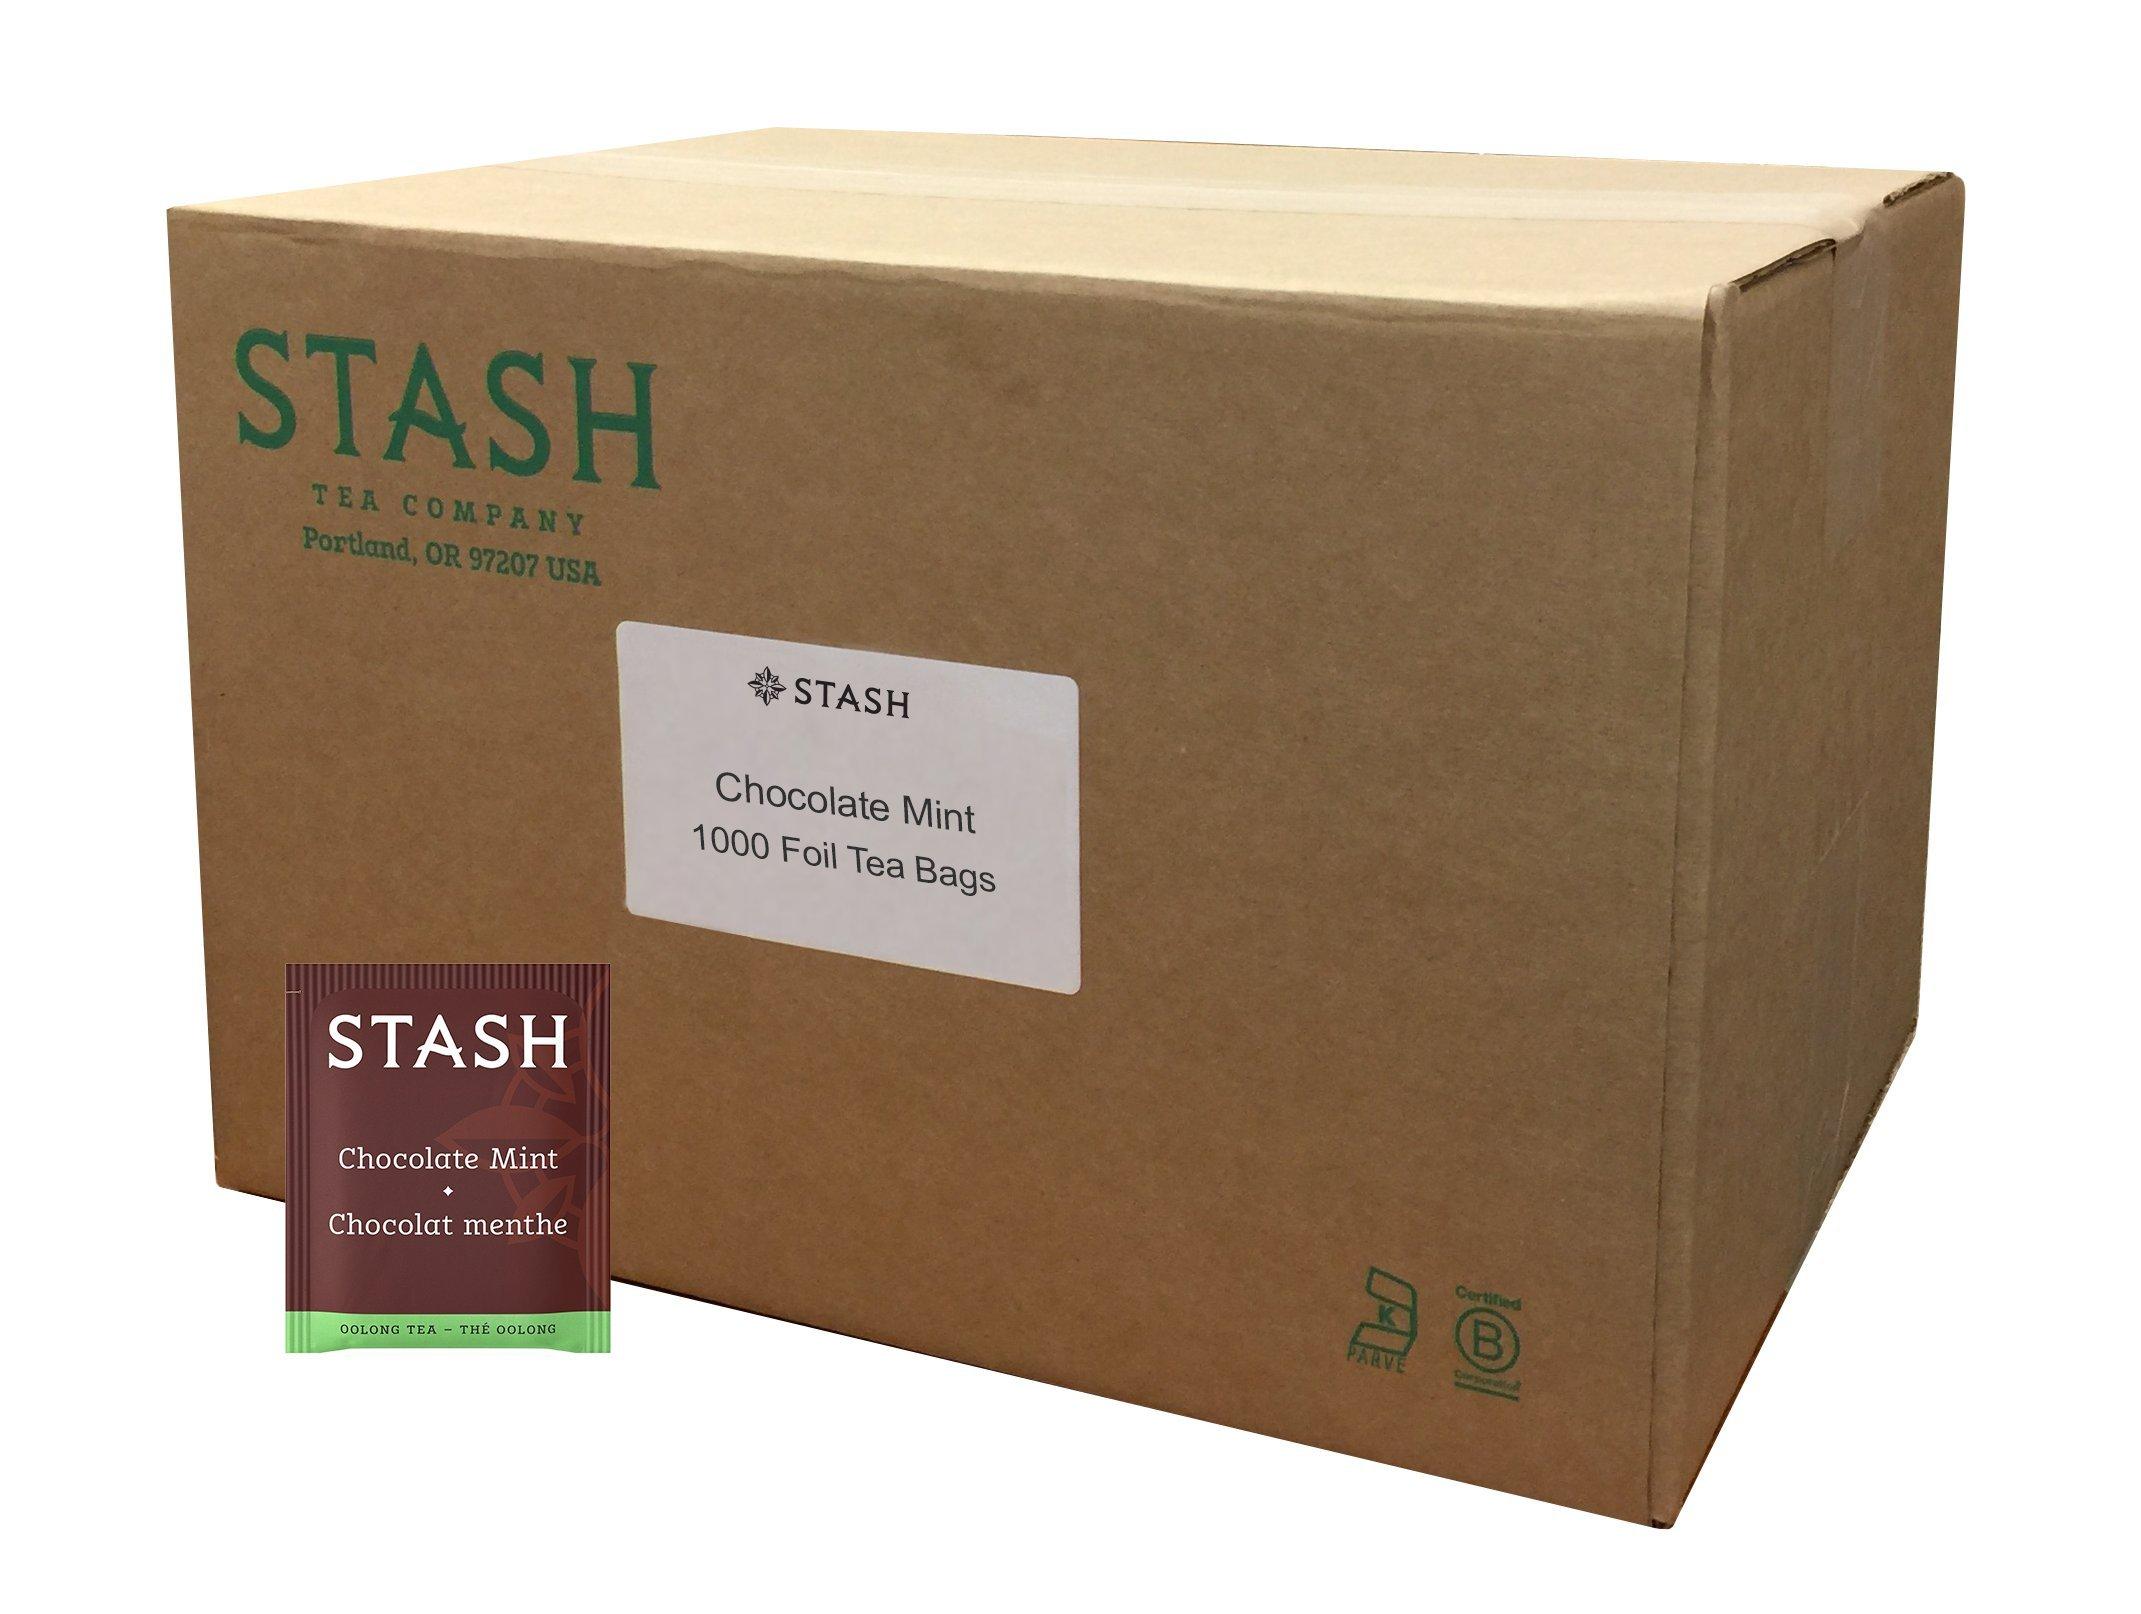 Stash Tea Chocolate Mint Wuyi Oolong Tea 1000 Count Tea Bags in Foil Individual Black Tea Bags for Use in Teapots Mugs or Cups, Brew Hot Tea or Iced Tea, Fair Trade Certified